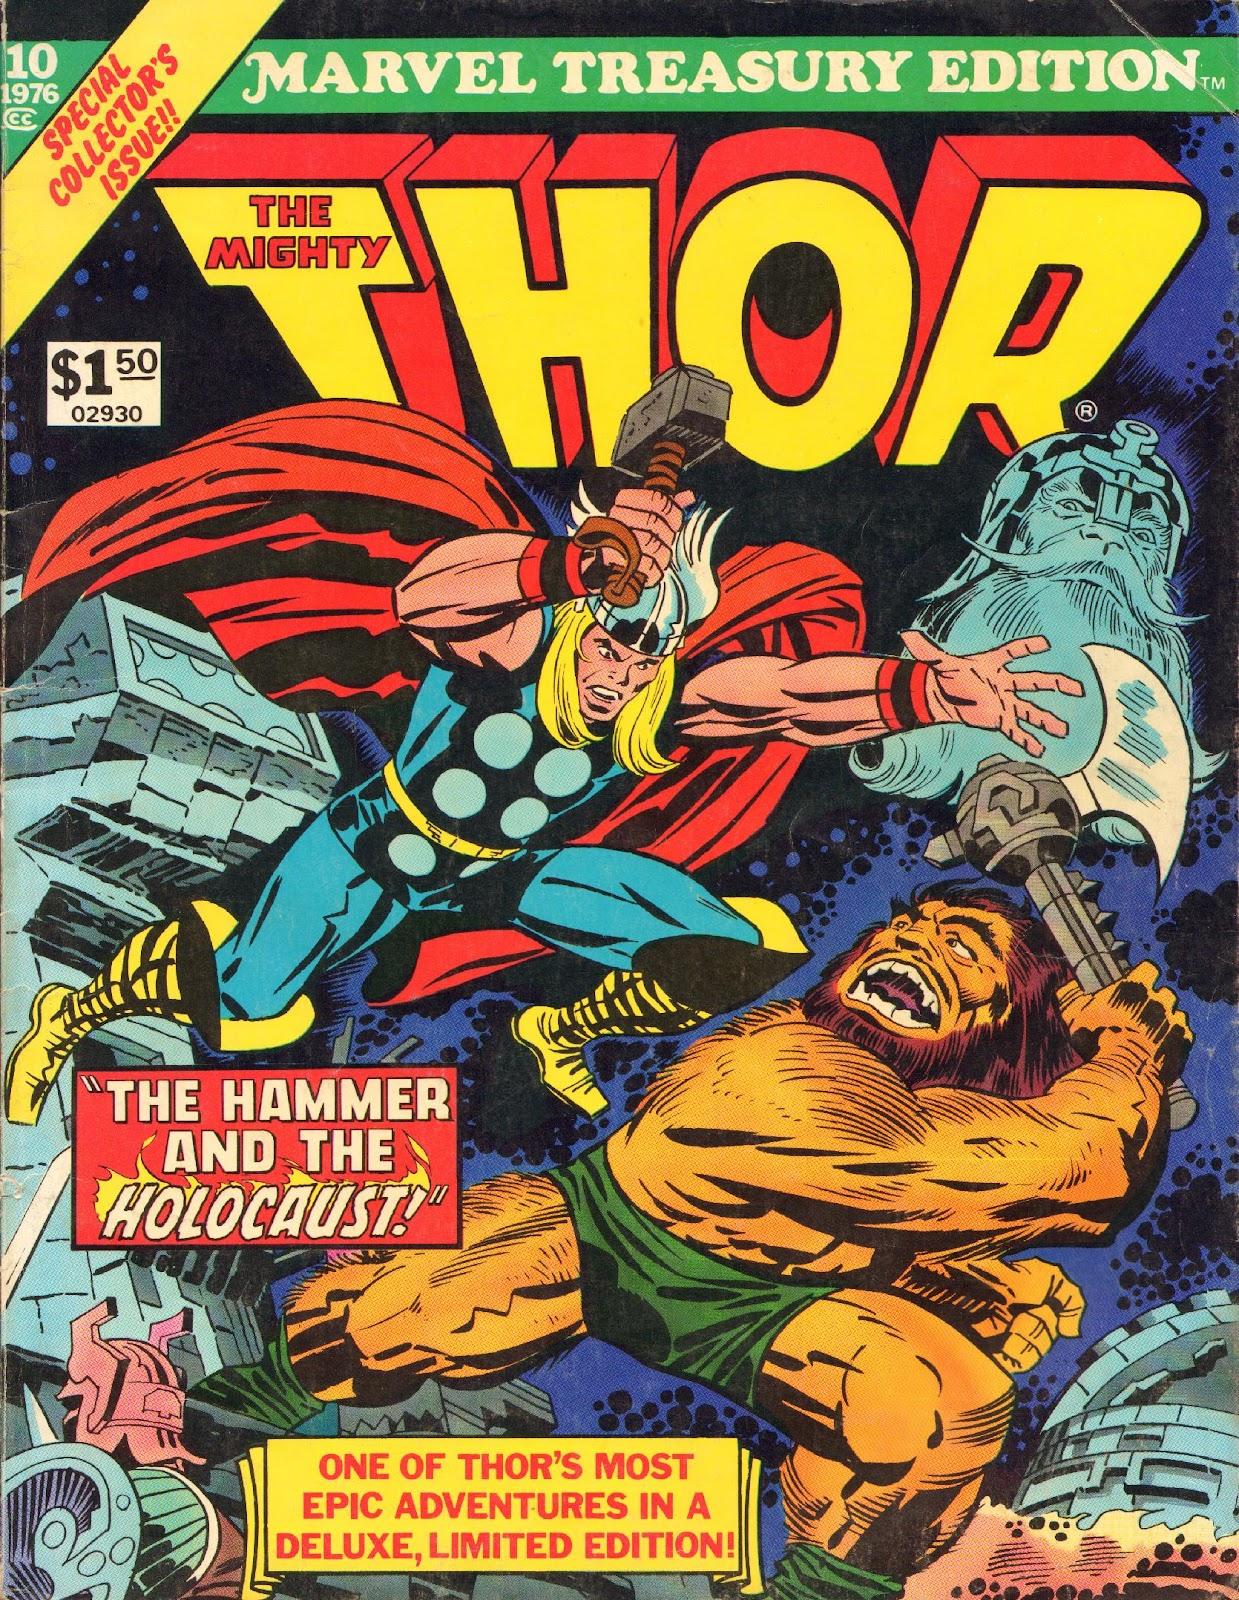 Marvel Treasury Edition 10 Page 1